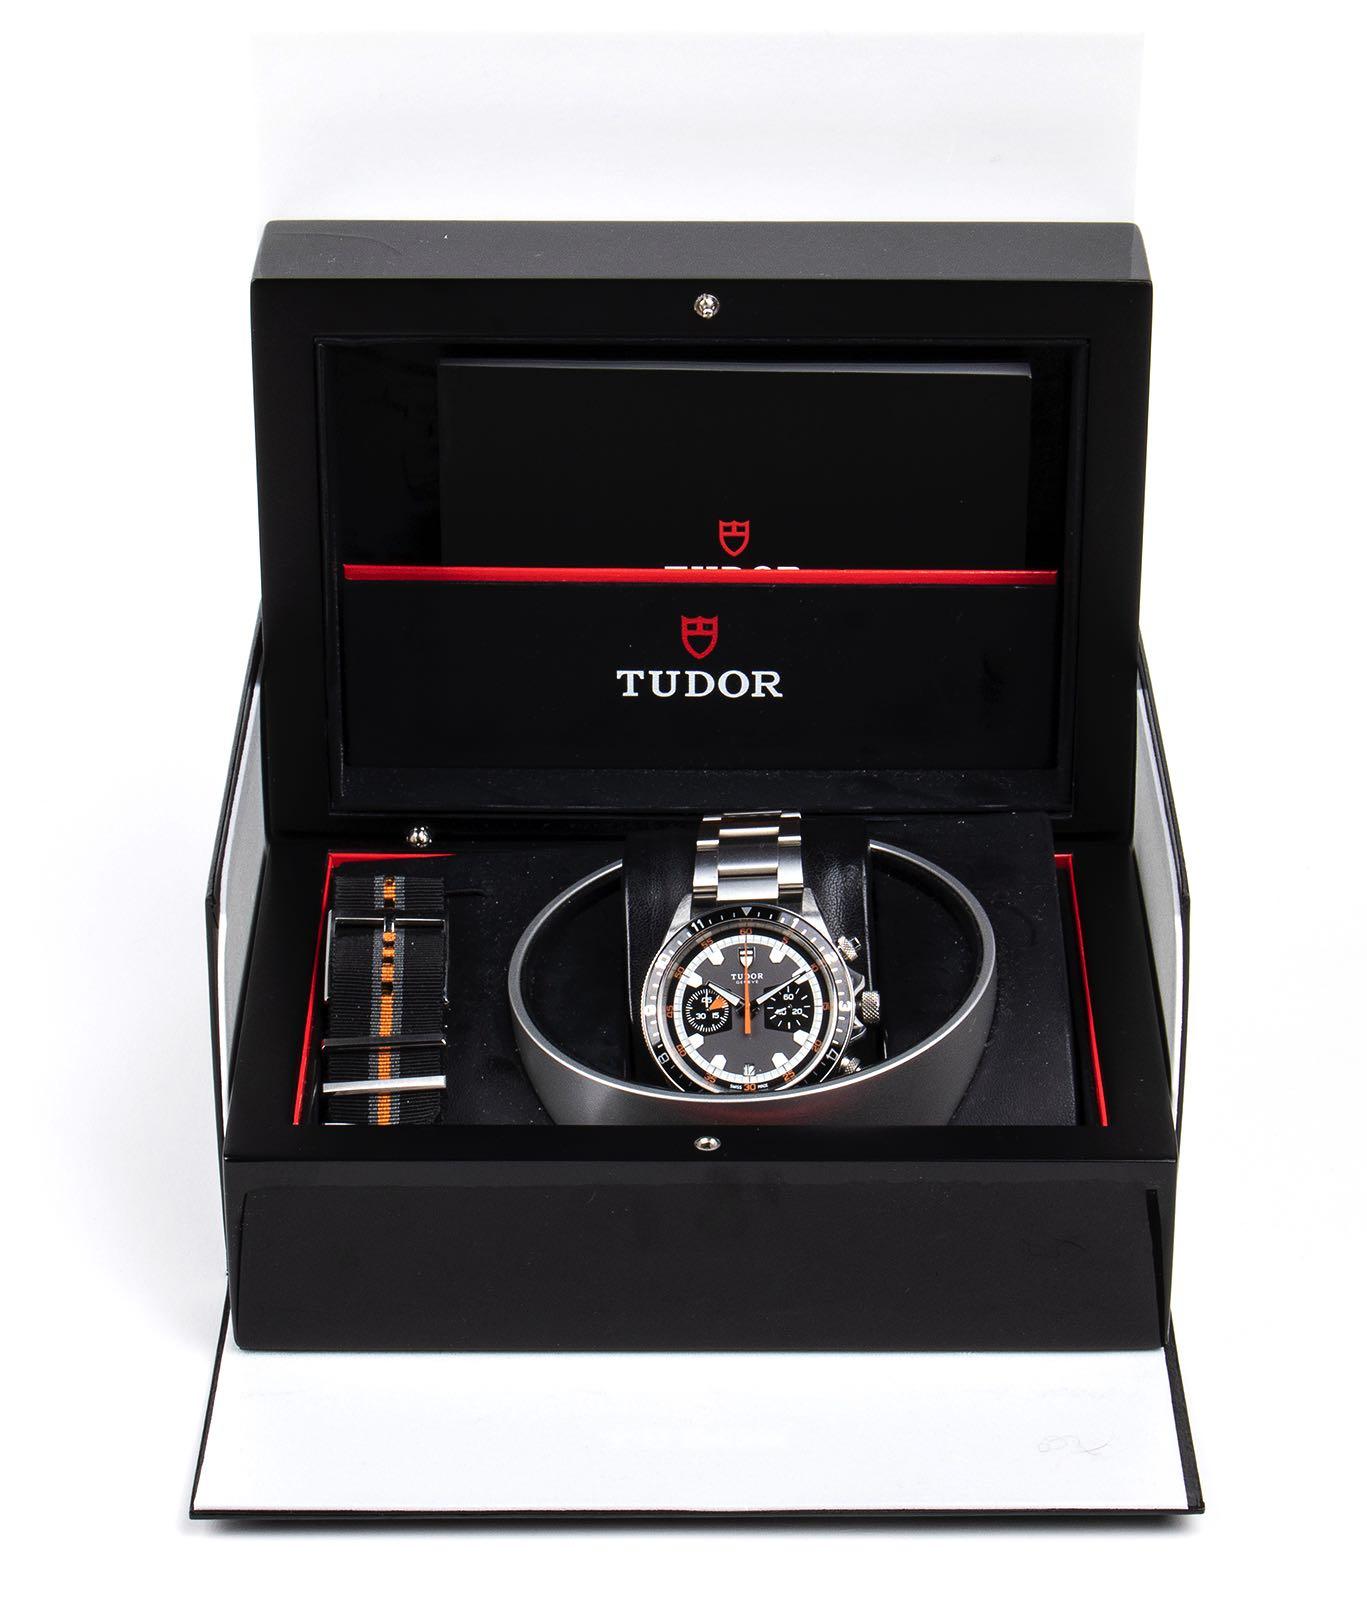 Tudor Chronograph, Montecarlo ref 70330N. - Image 3 of 3